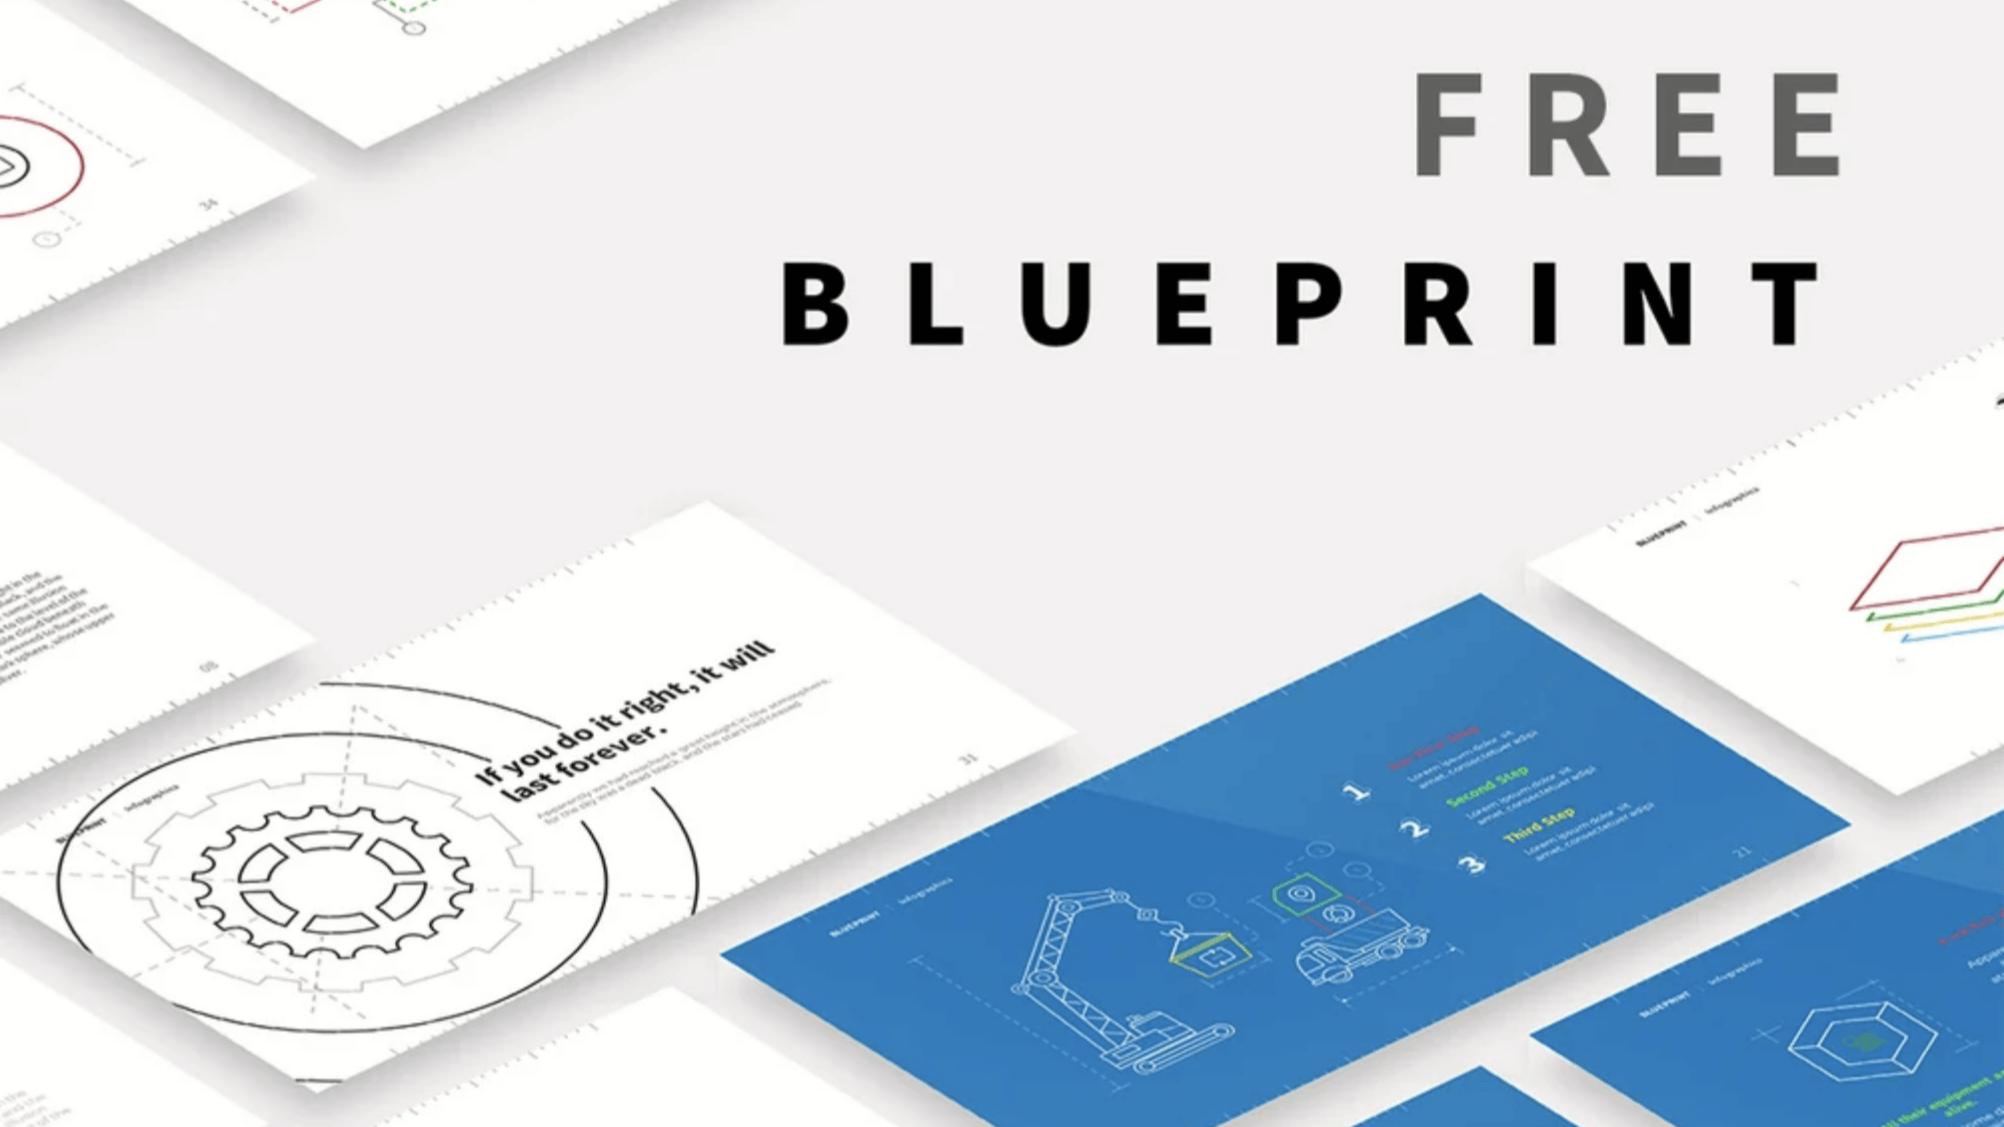 Free BLUEPRINT Presentation Template